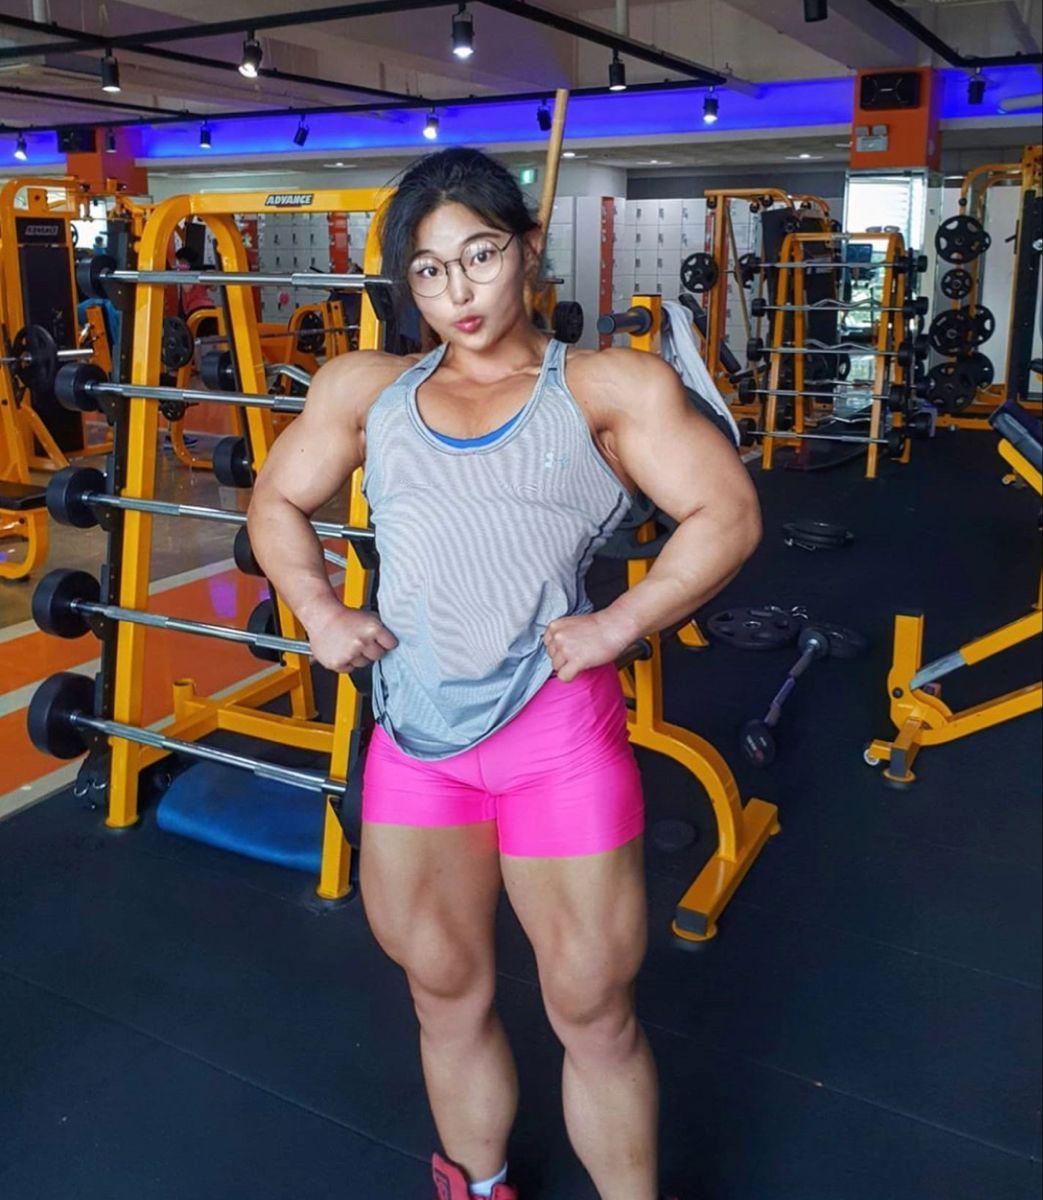 Pin By Calvis Shade On Femalebodybuilding Muscle Women Body Building Women Sports Women